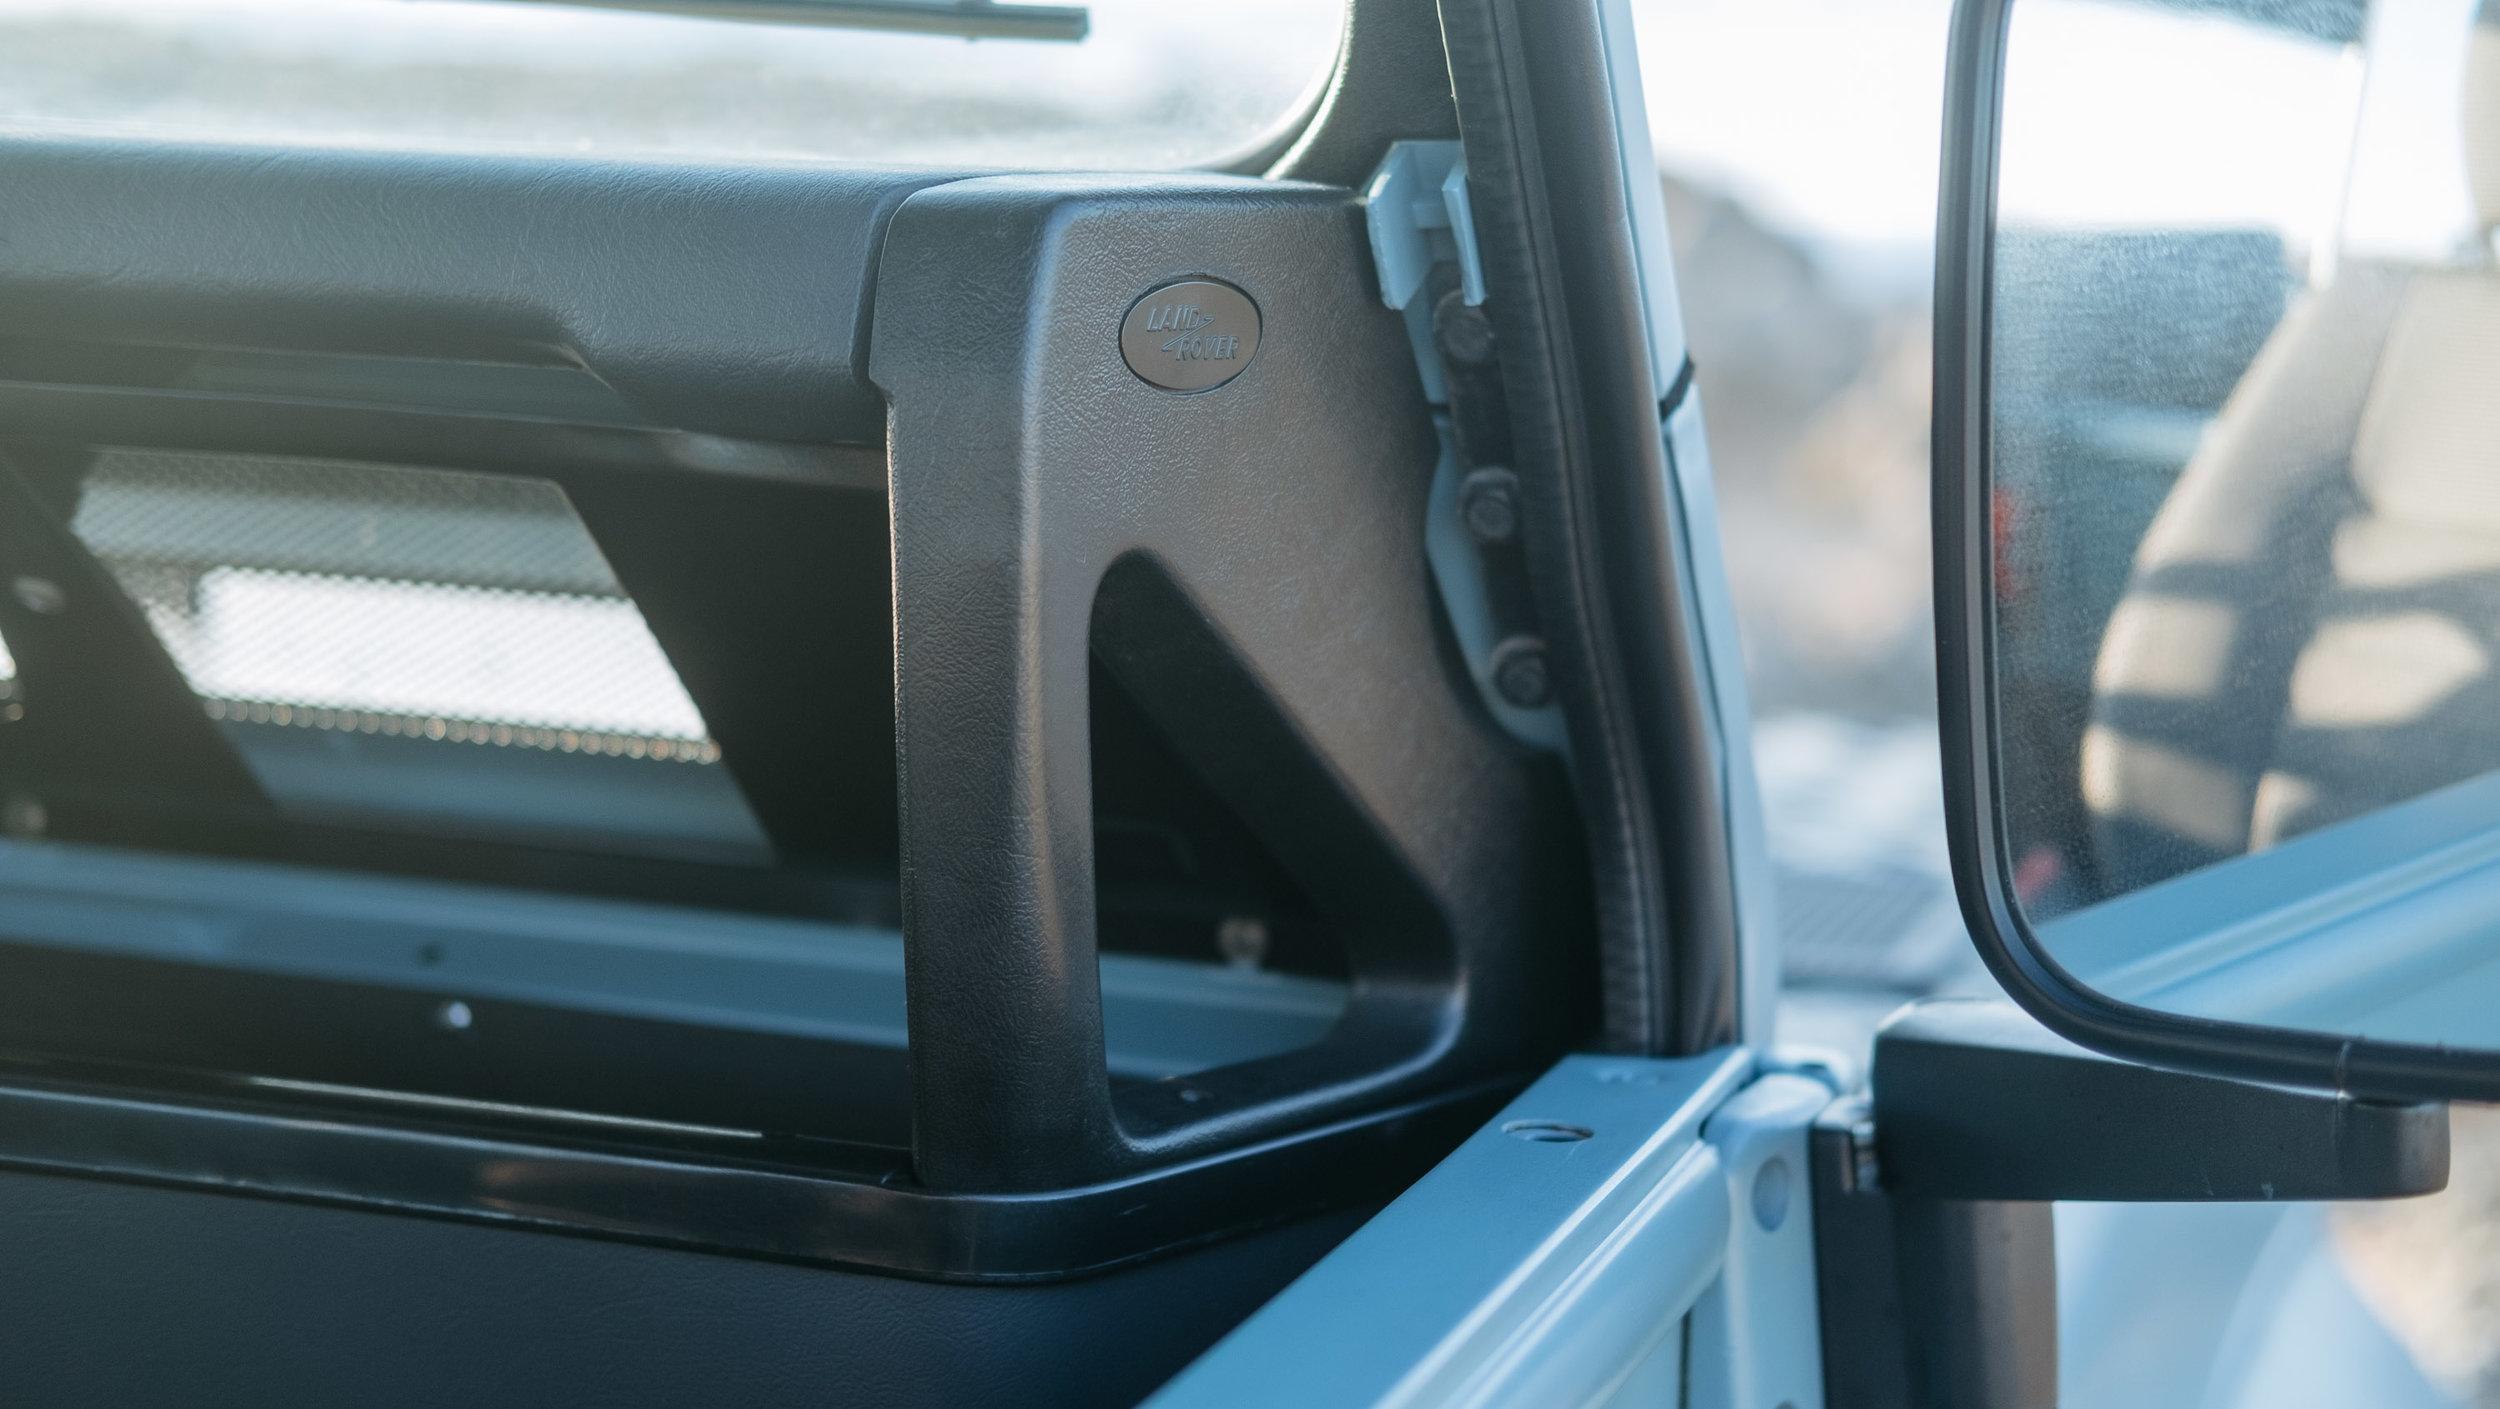 coolnvintage Land Rover Defender (56 of 98).jpg